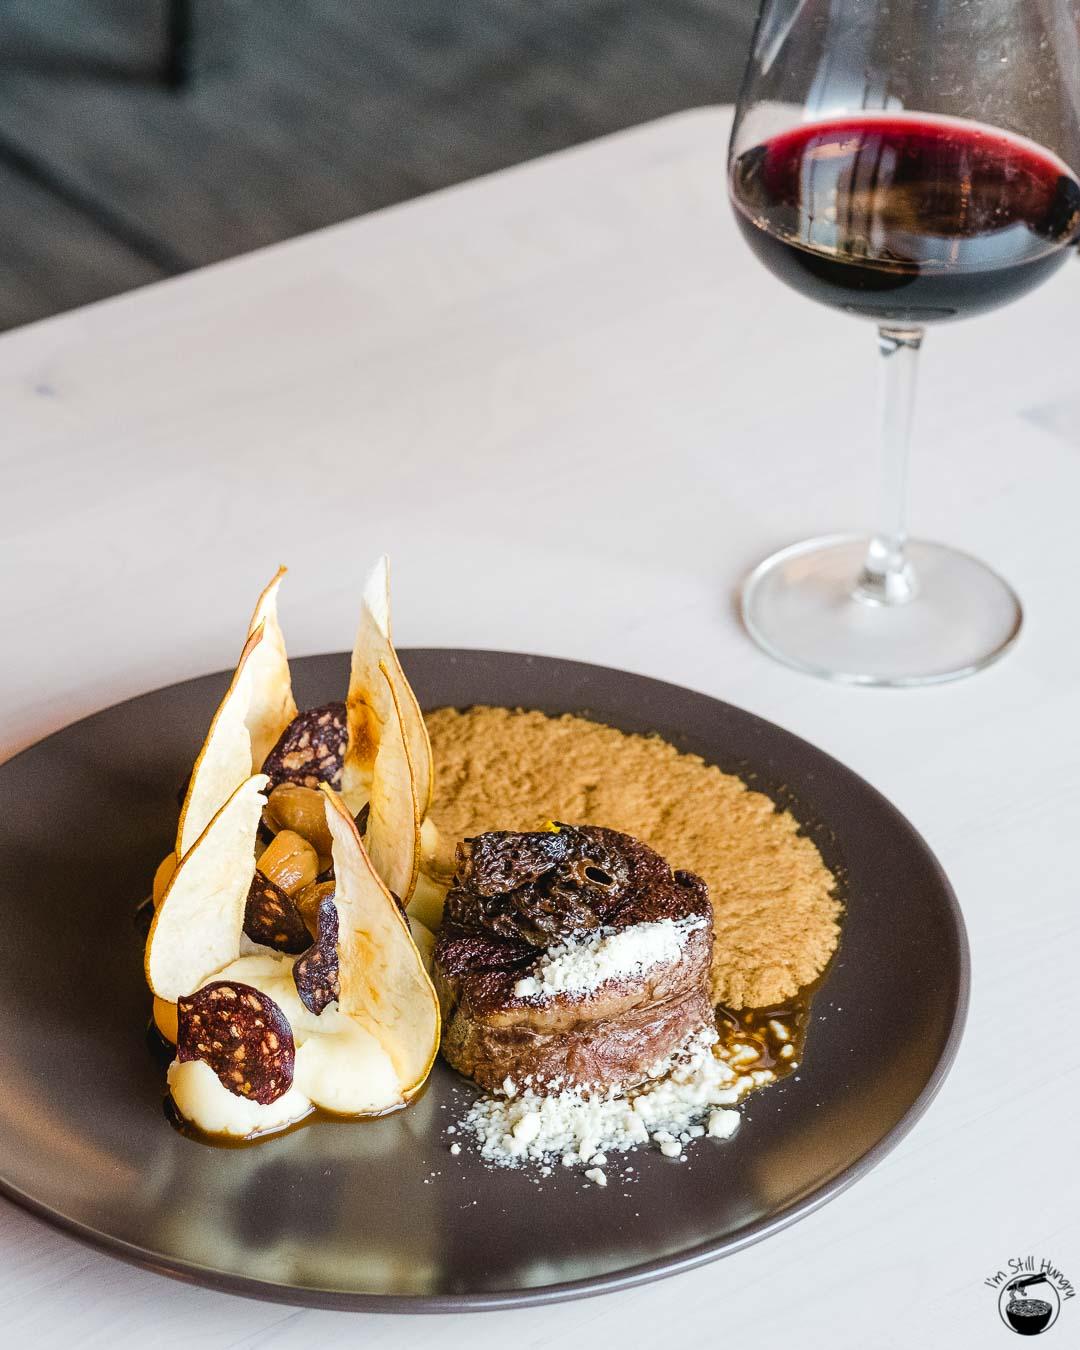 Blue Wren Restaurant Sous vide chateaubriand, cacao, smoked potato puree, pear, black pudding crisp, morels, vegemite foam, horseradish snow